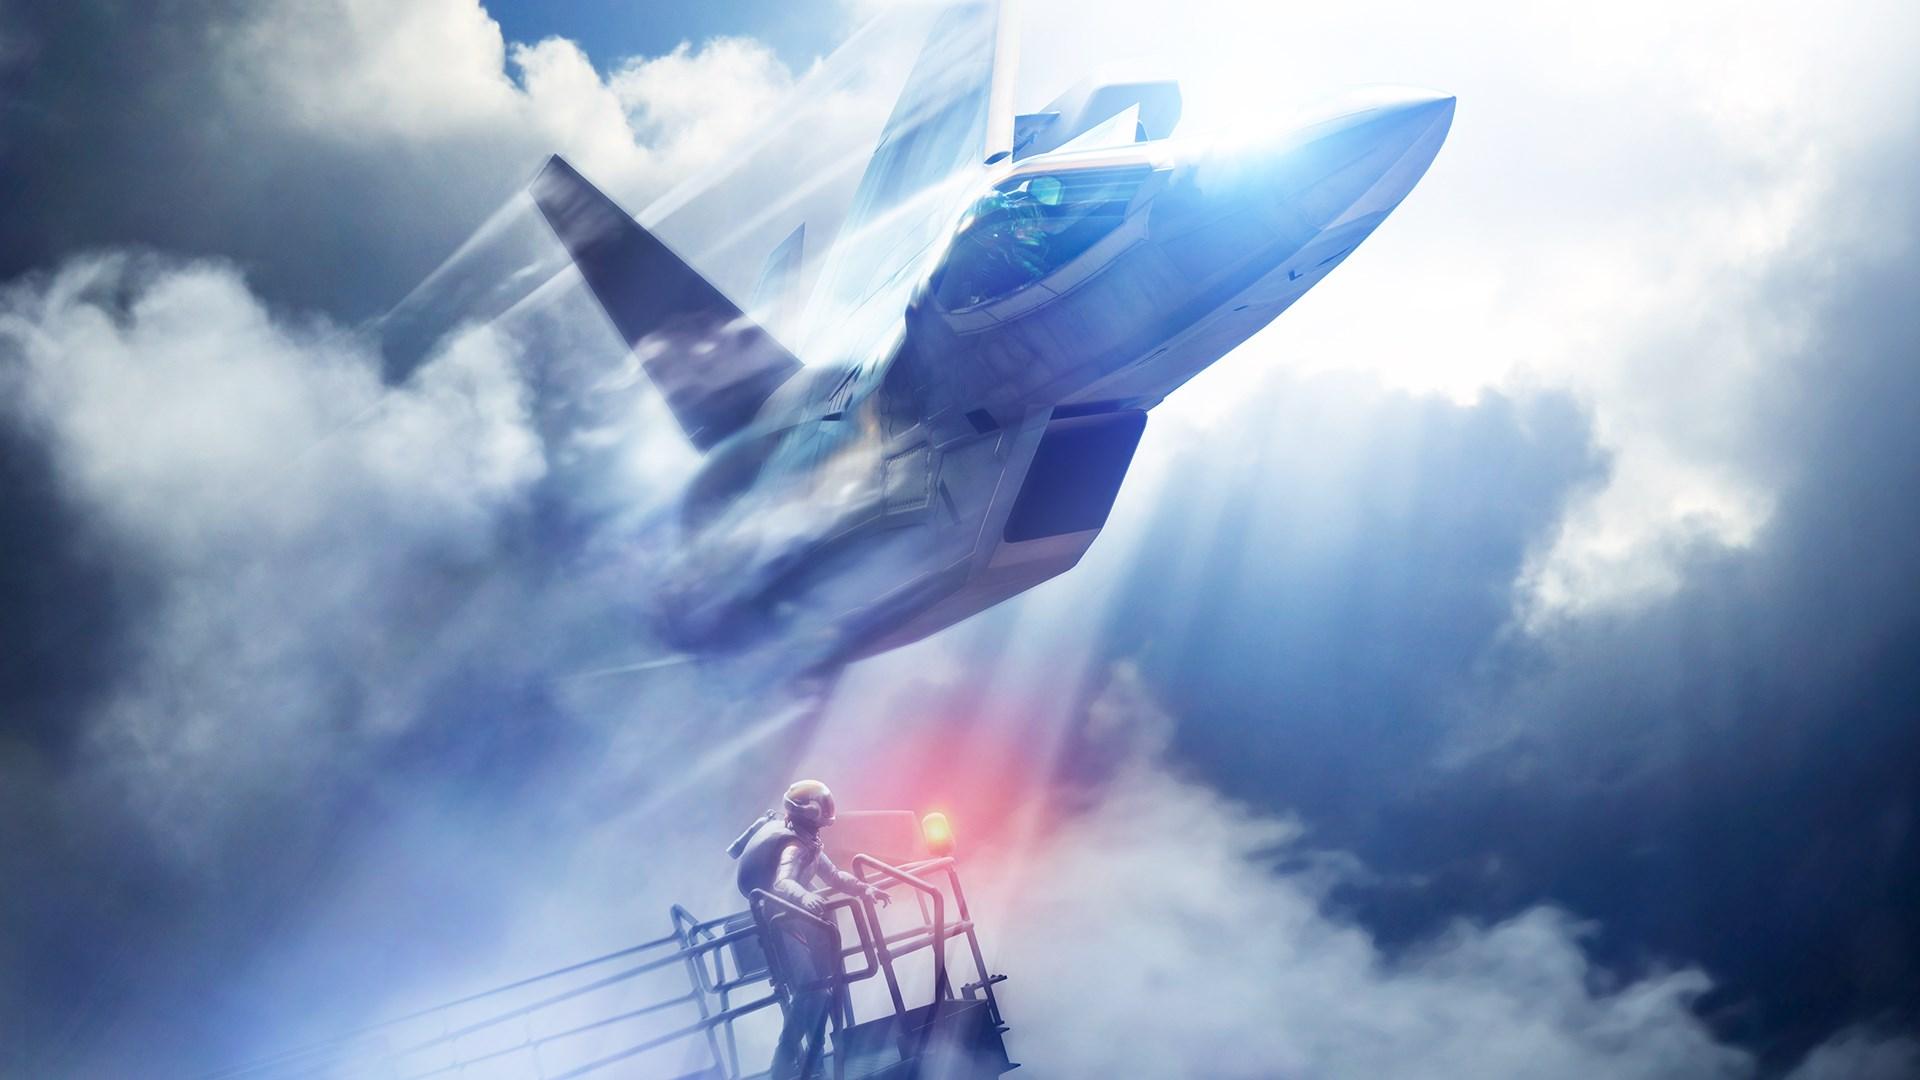 ACE COMBAT 7: SKIES UNKNOWN Edição Deluxe